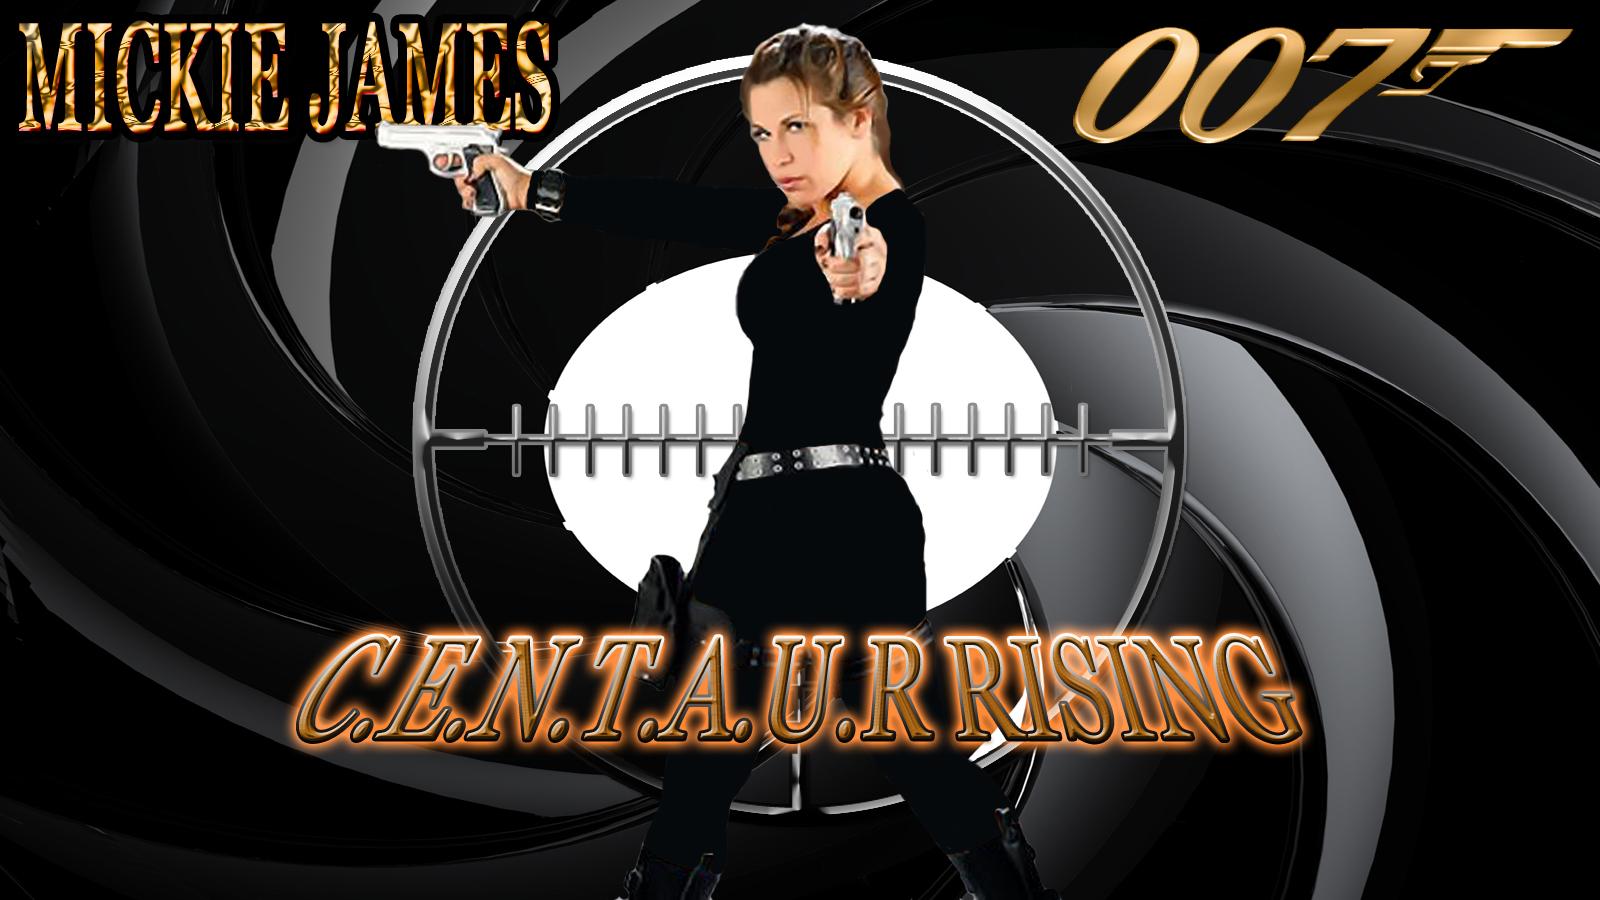 Mickie James - 007 C.E.N.T.A.U.R RISING wp